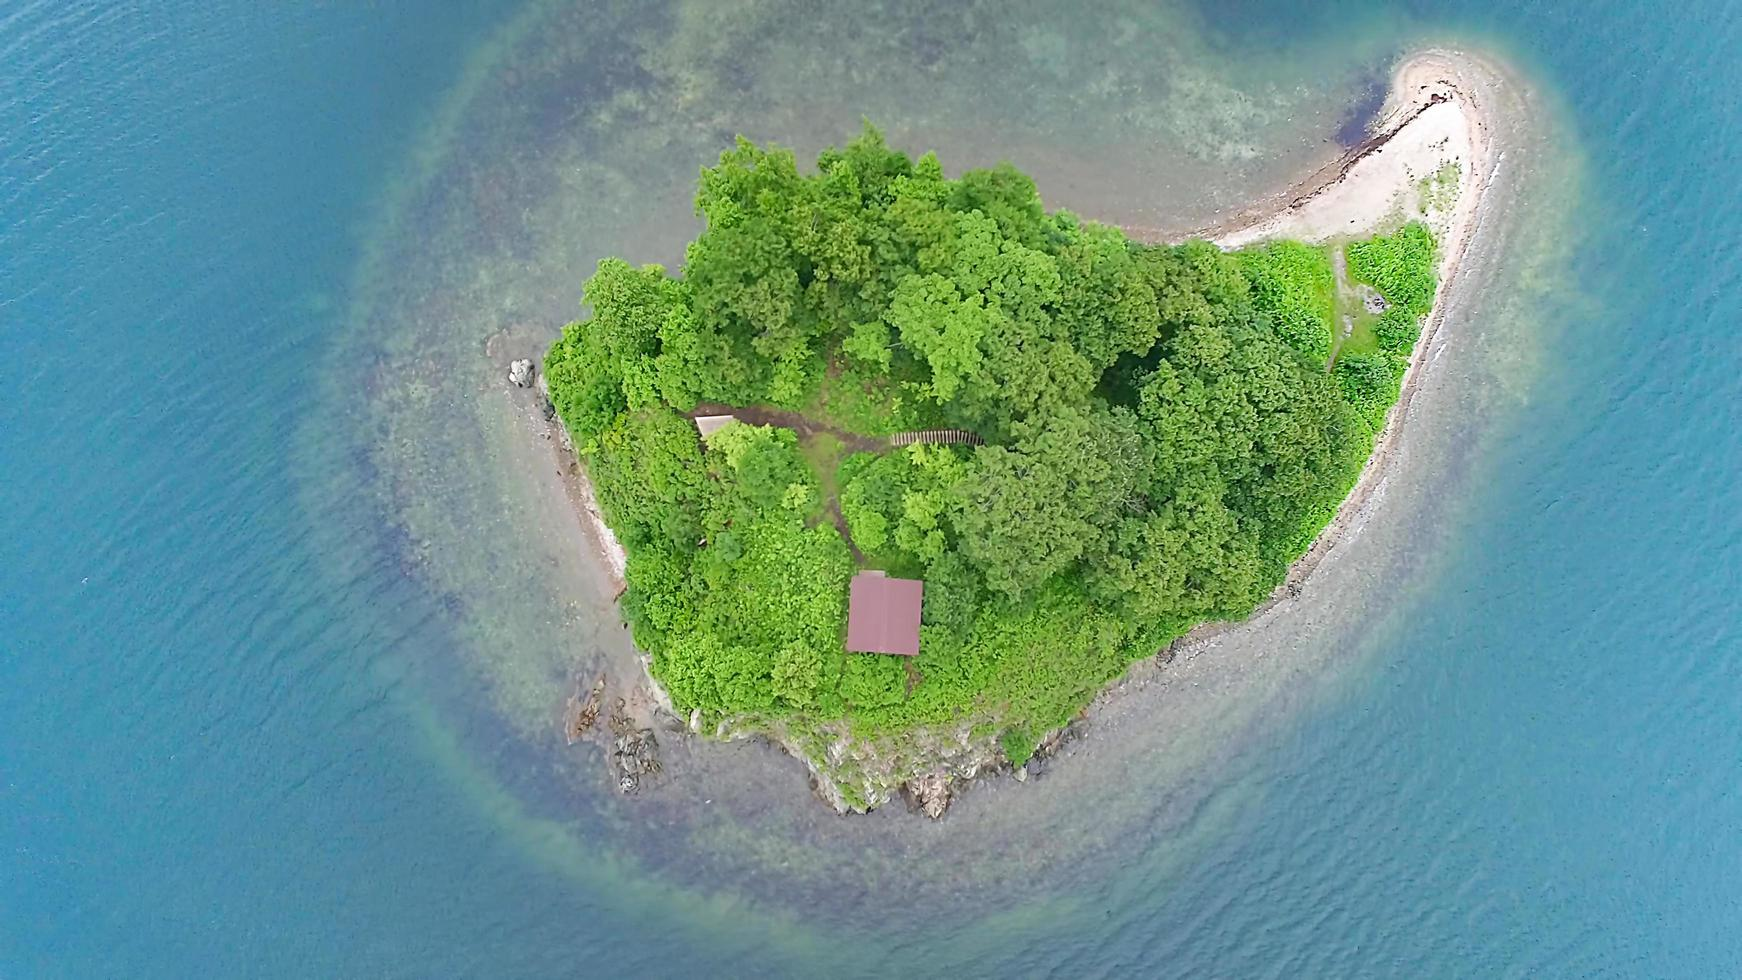 luftrecension av ön papenberg i japanska havet. foto